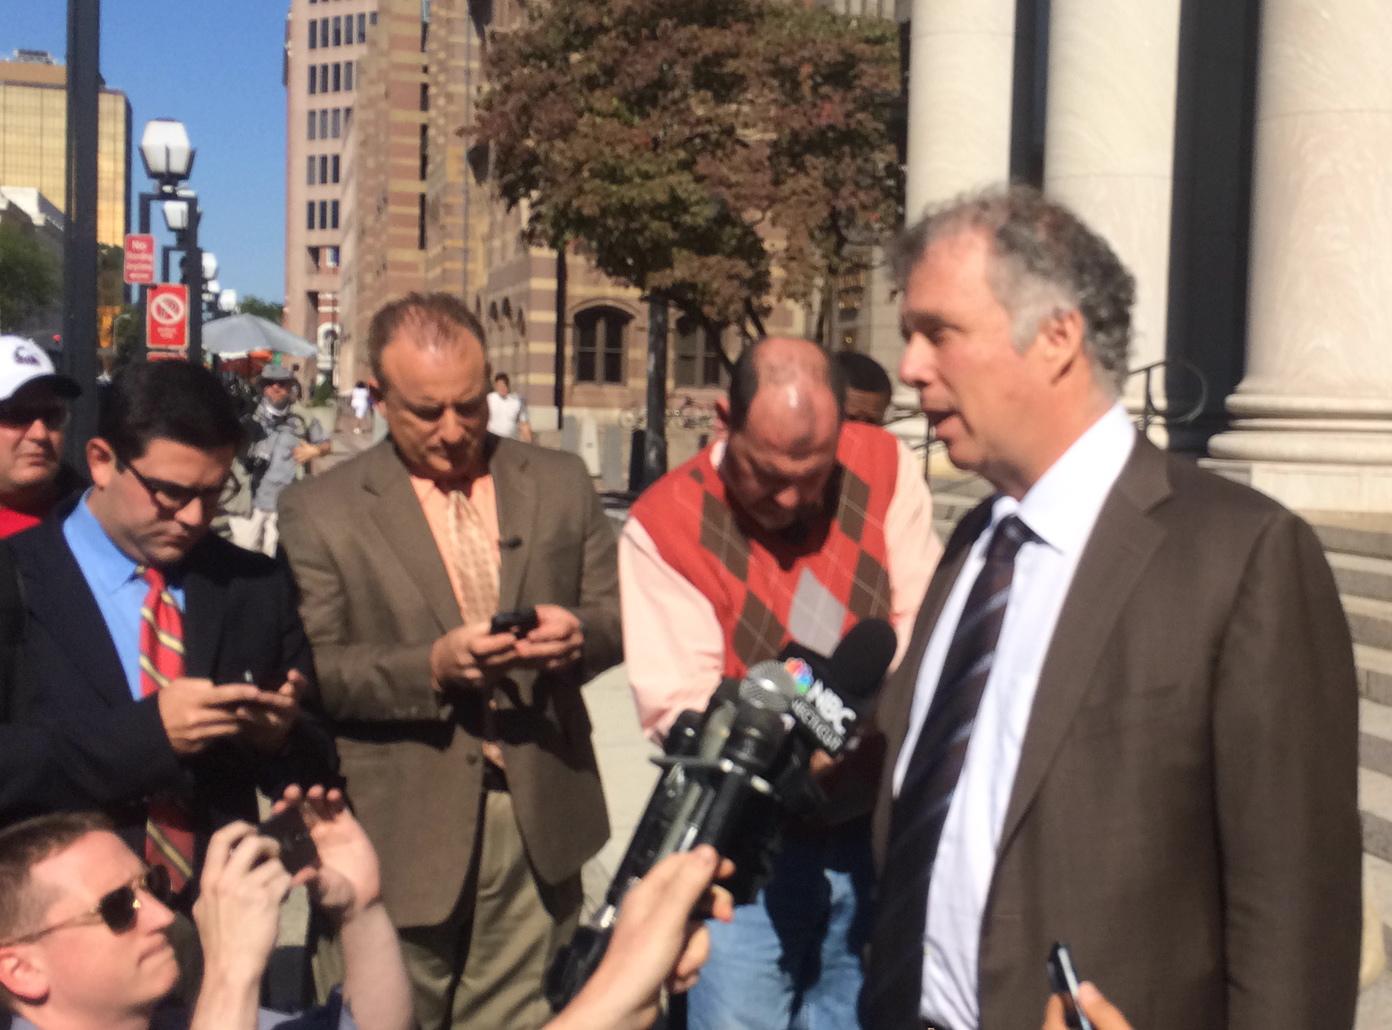 Reid H. Weingarten tells reporters Rowland will appeal.